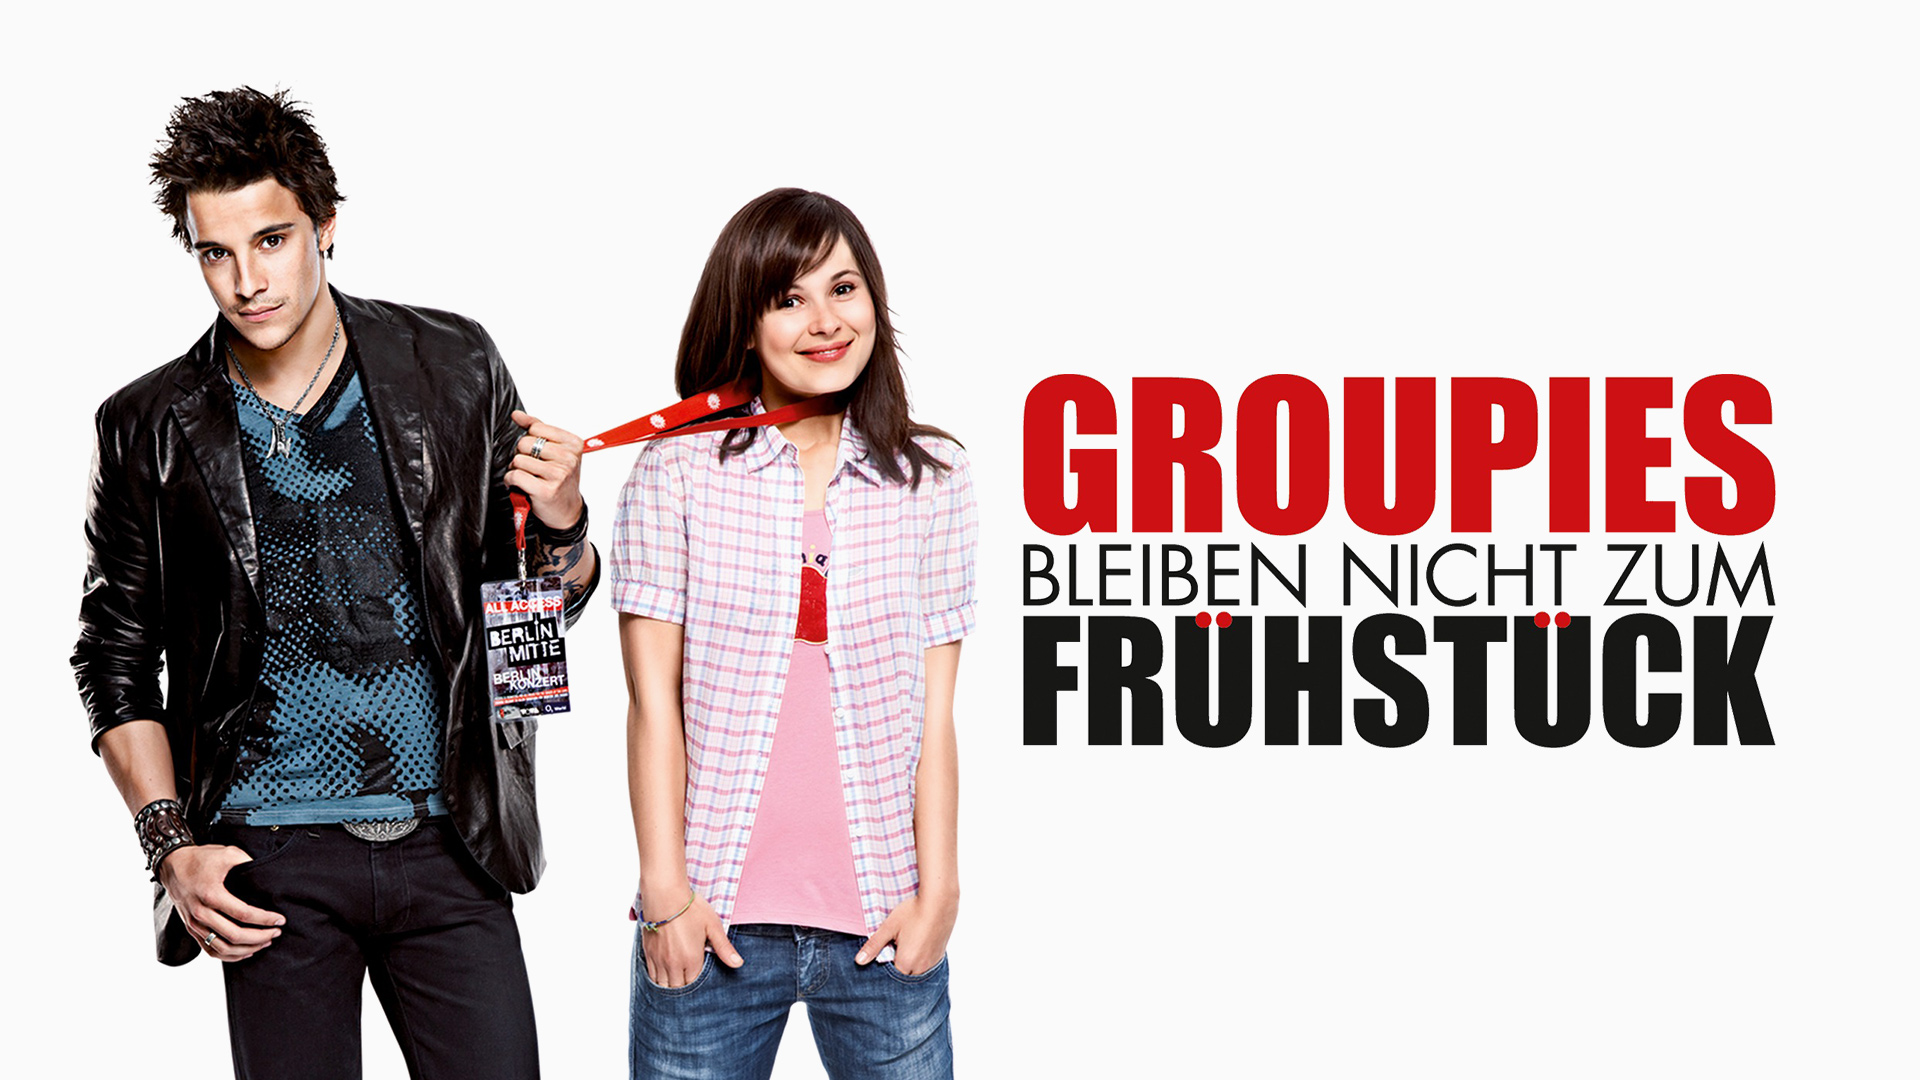 Groupies Bleiben Nicht Zum Fruhstuck